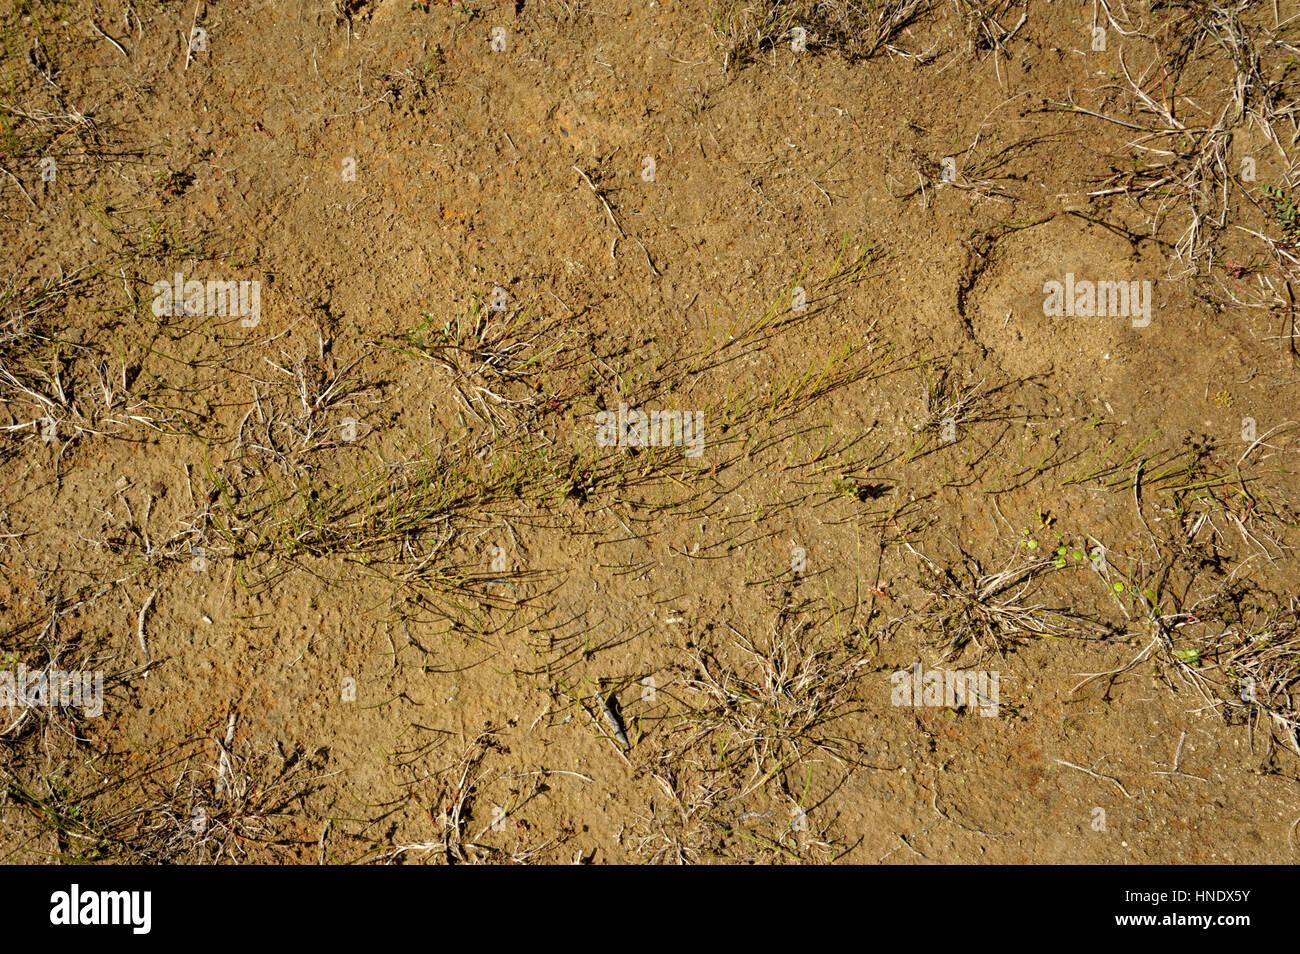 Rhizome Lines in Mud - Stock Image